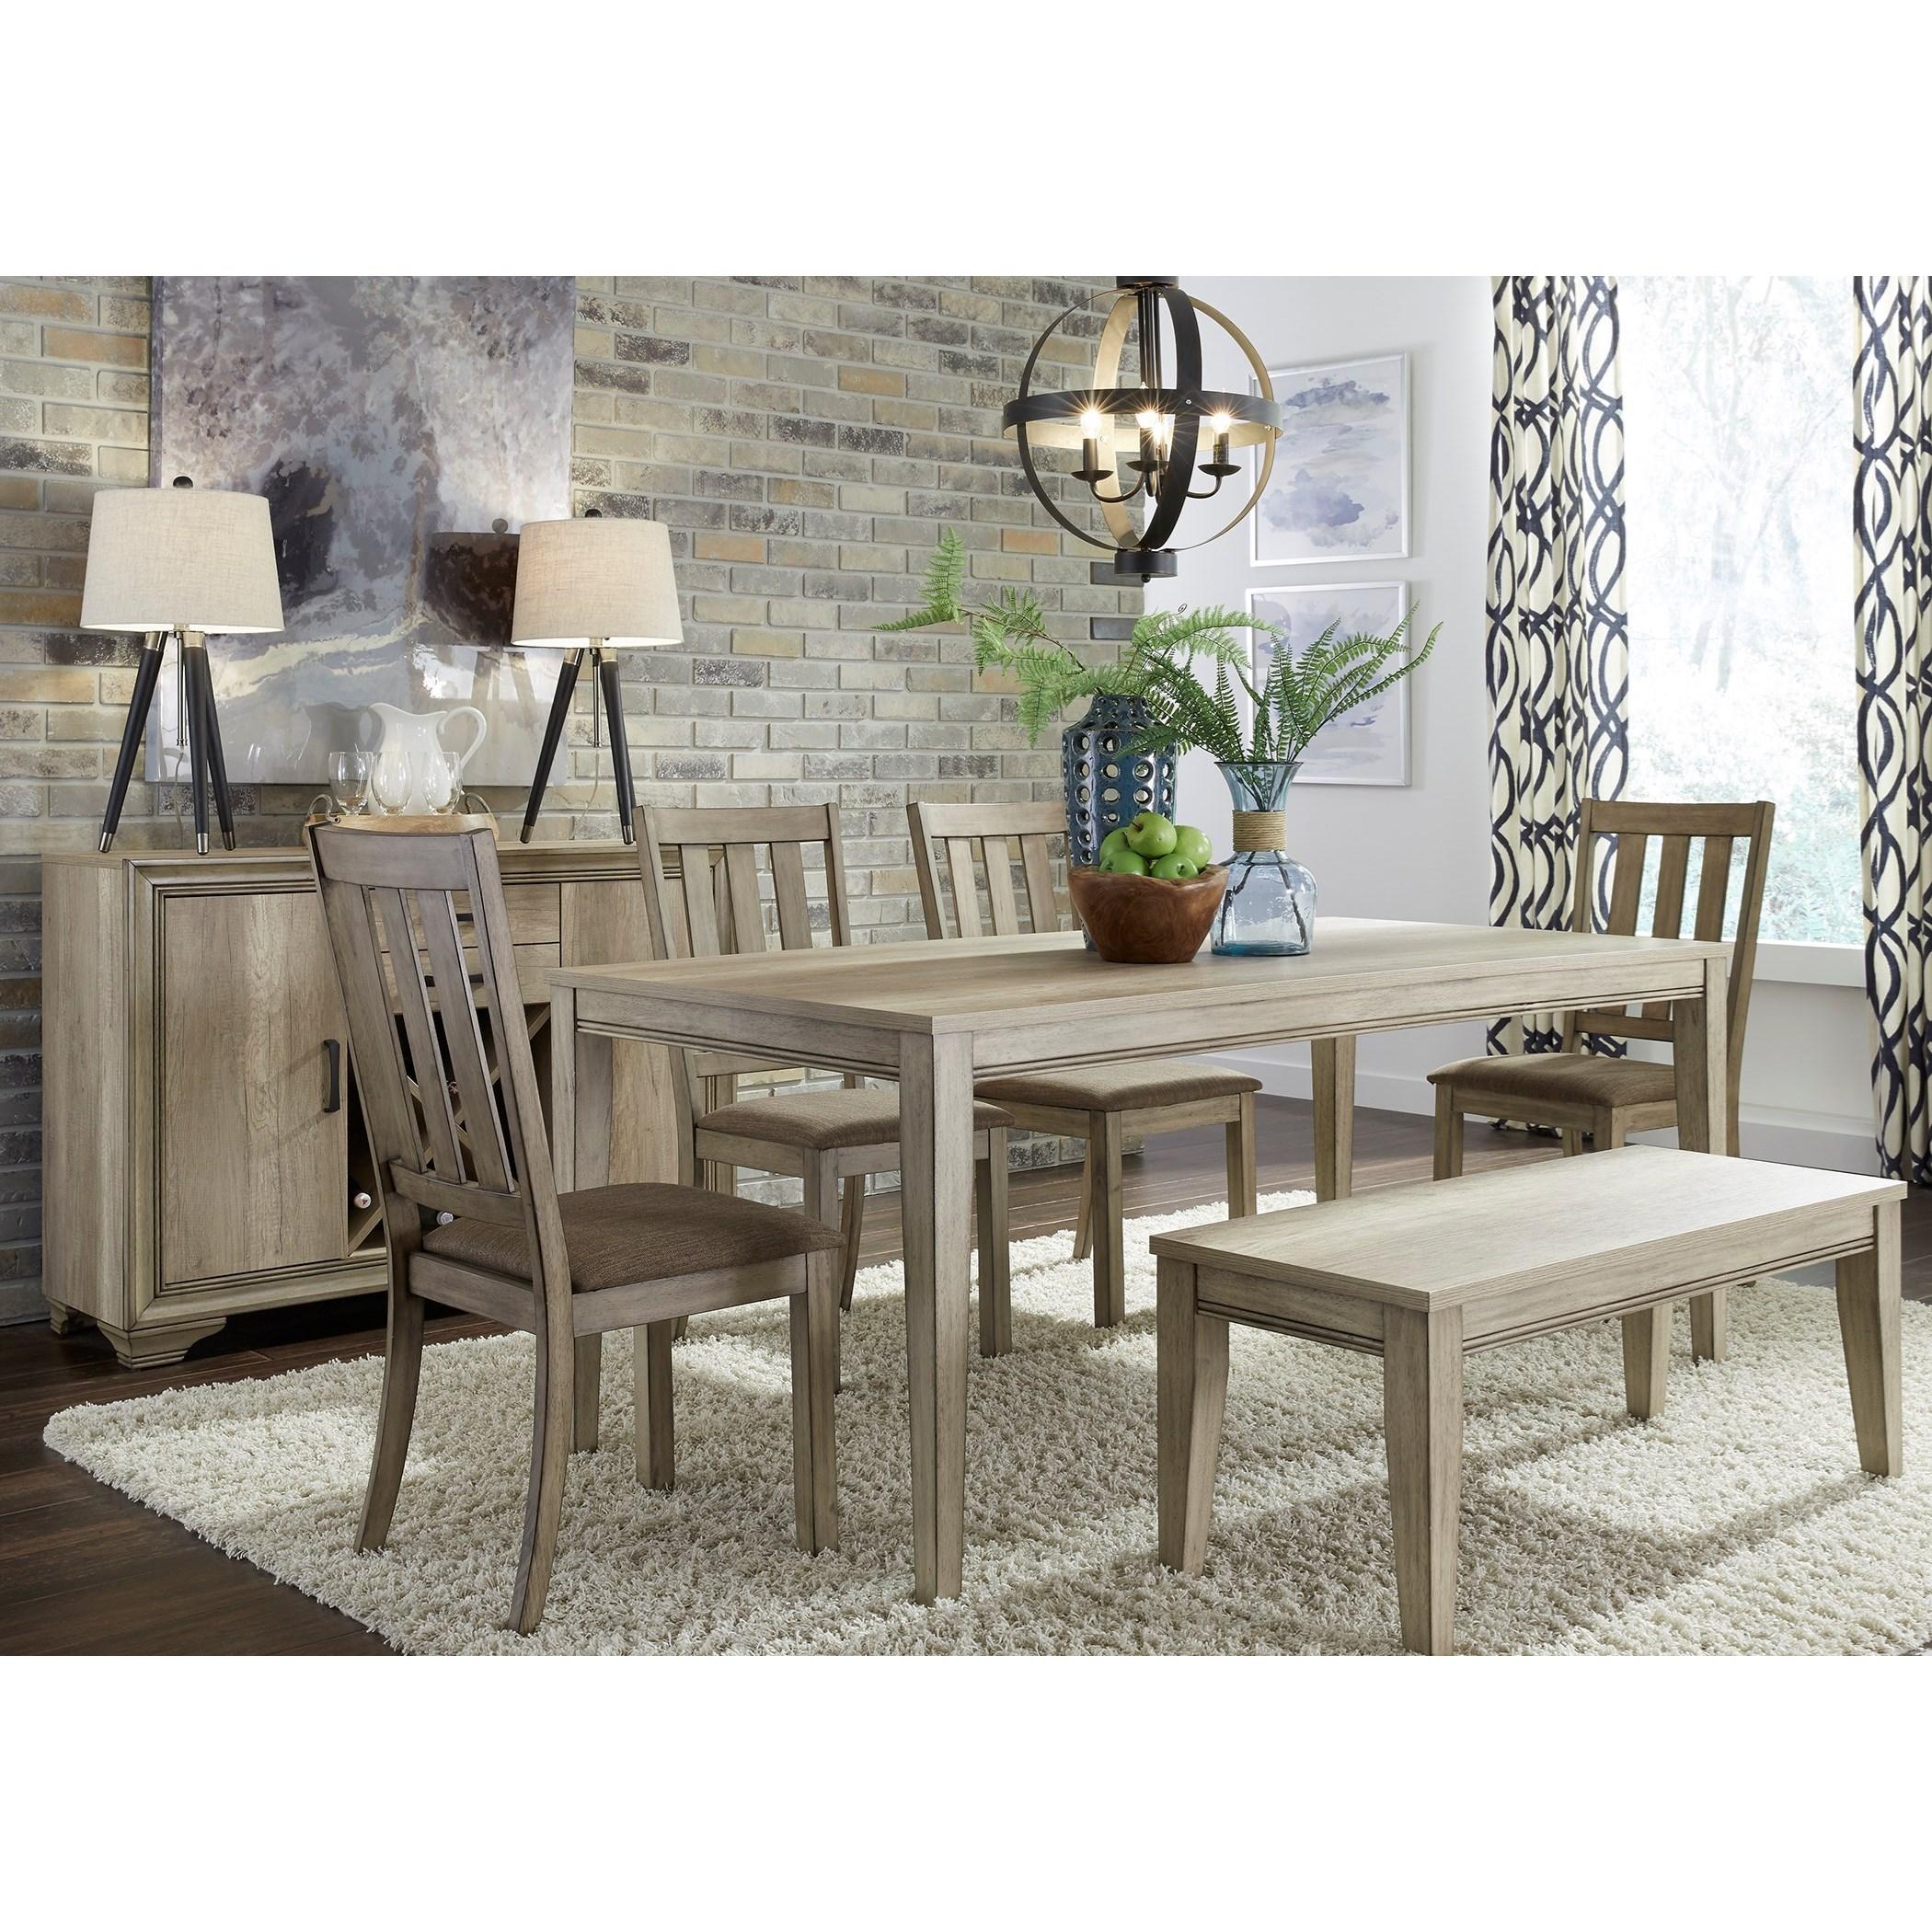 Sun Valley 6 Piece Rectangular Table Set by Liberty Furniture at Johnny Janosik